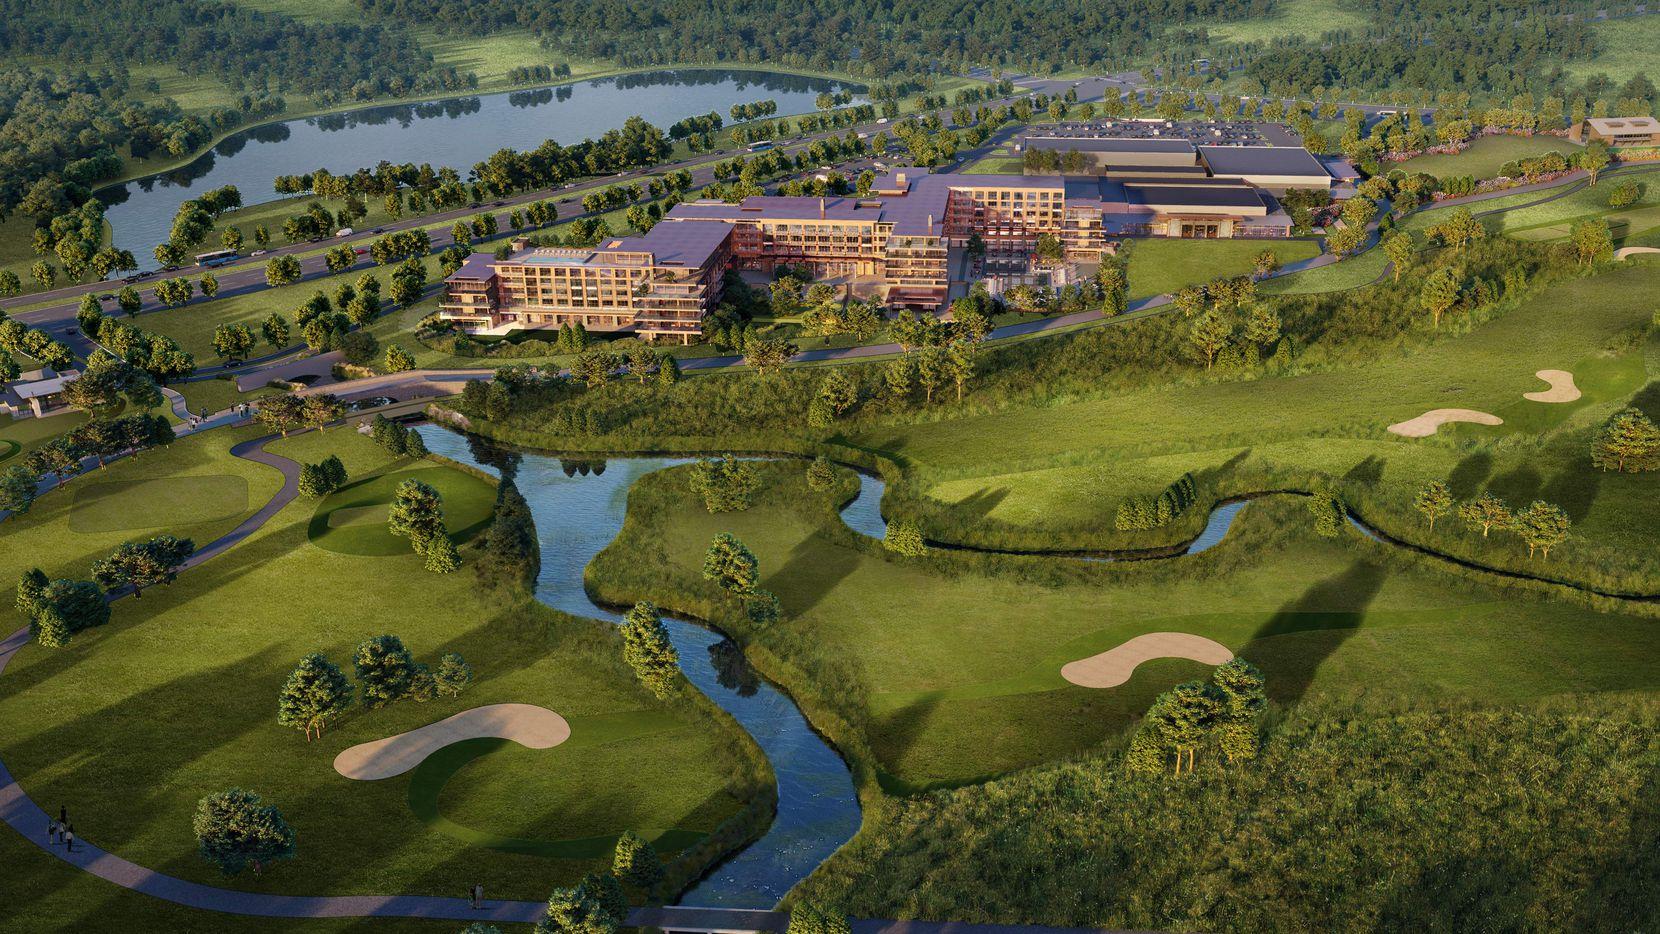 The 501-room Omni PGA Frisco Resort will open in 2023.